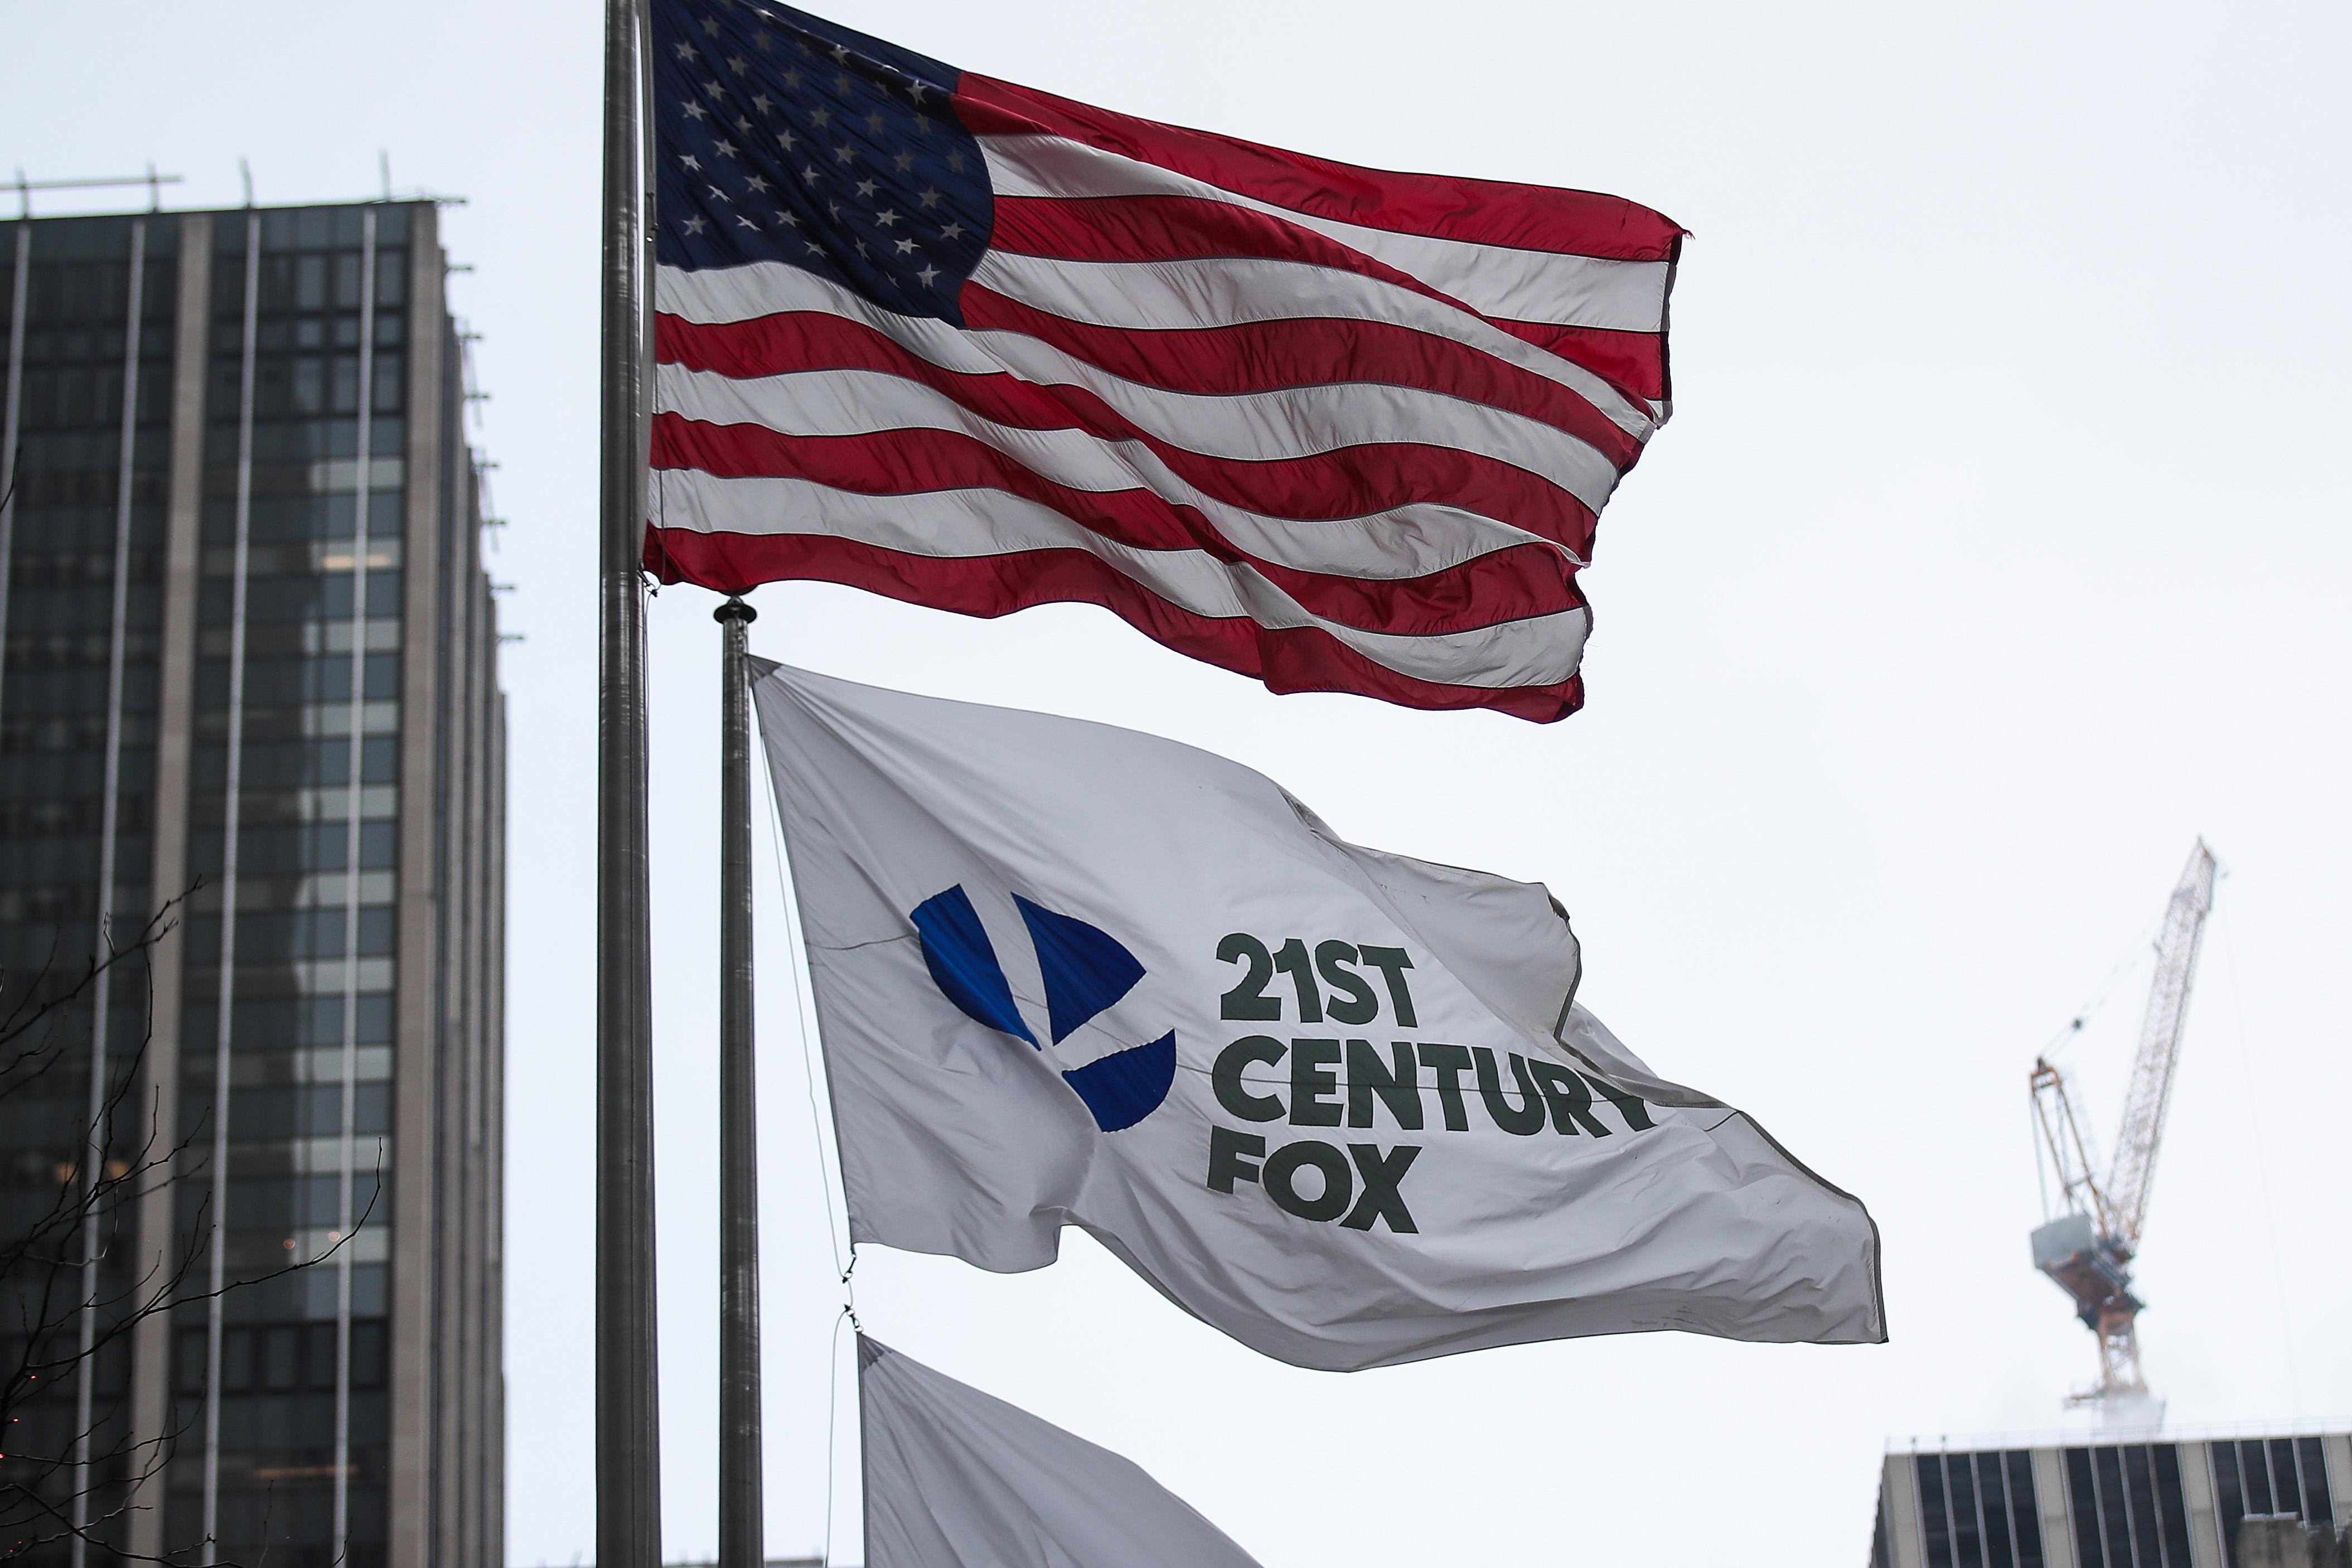 Disney To Buy 21st Century Fox's Entertainment Business